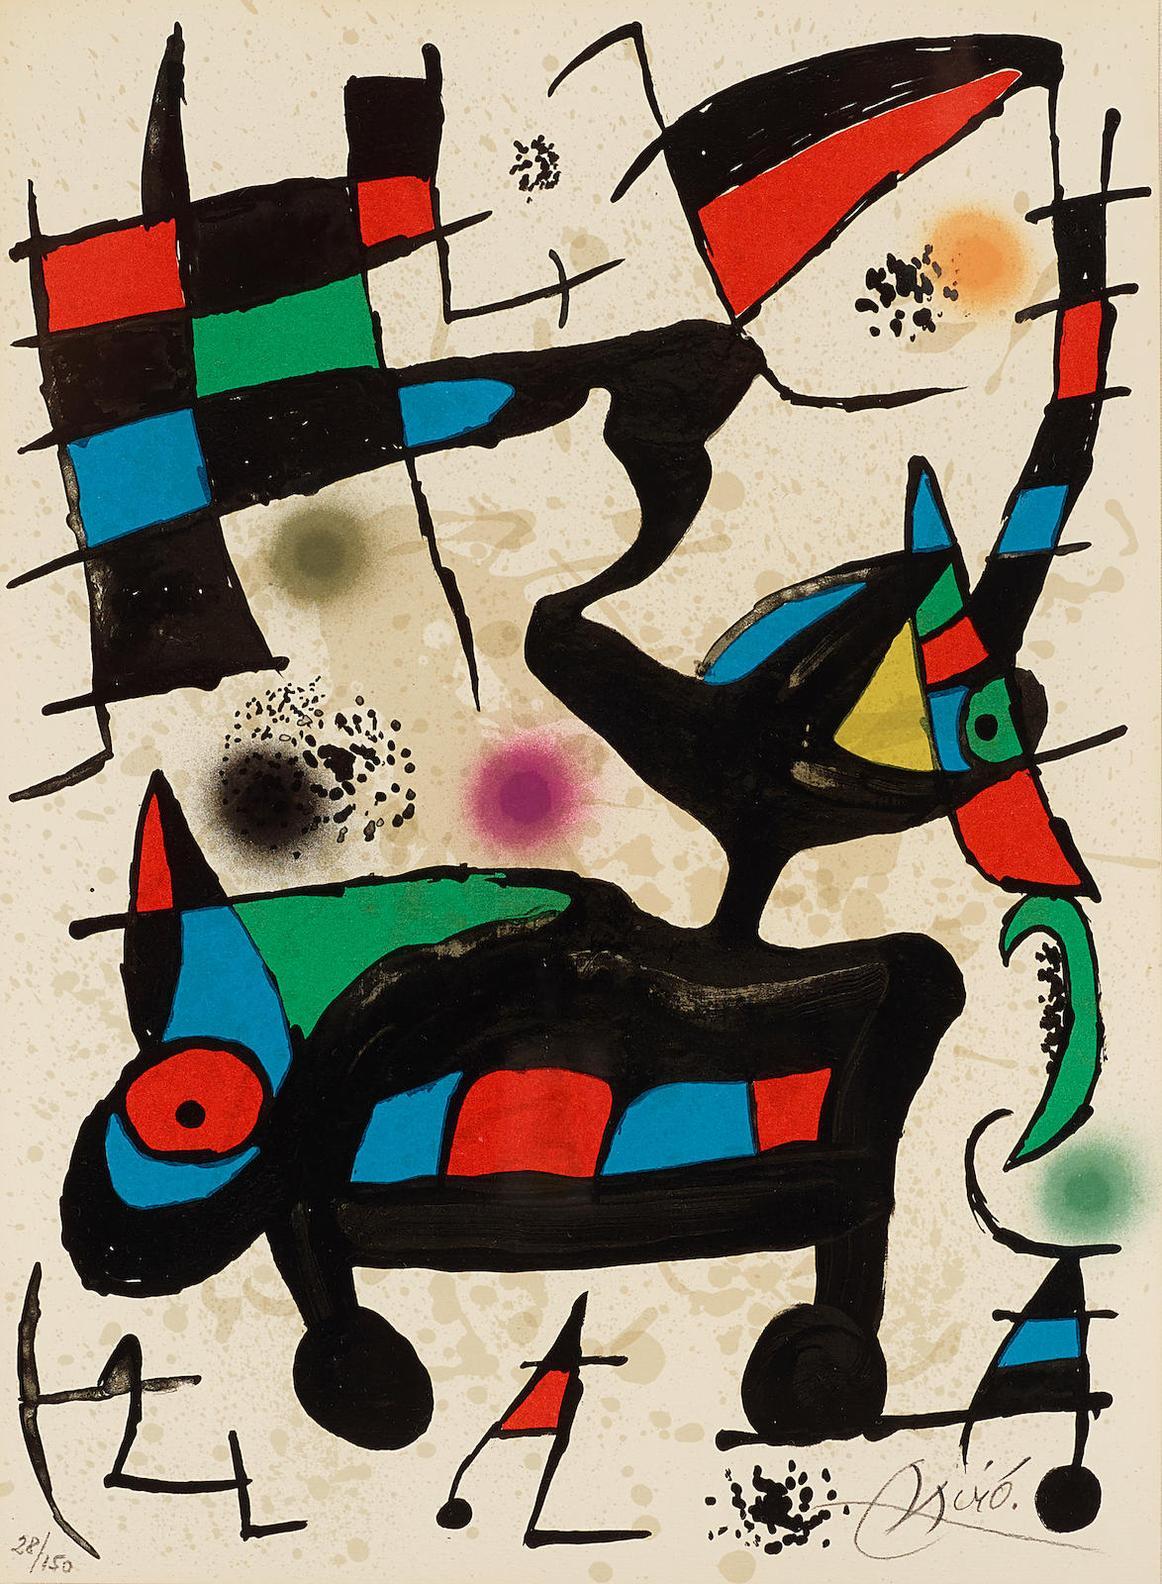 Joan Miro-Untitled, Pl. 1, From Oda A Joan Miro-1973